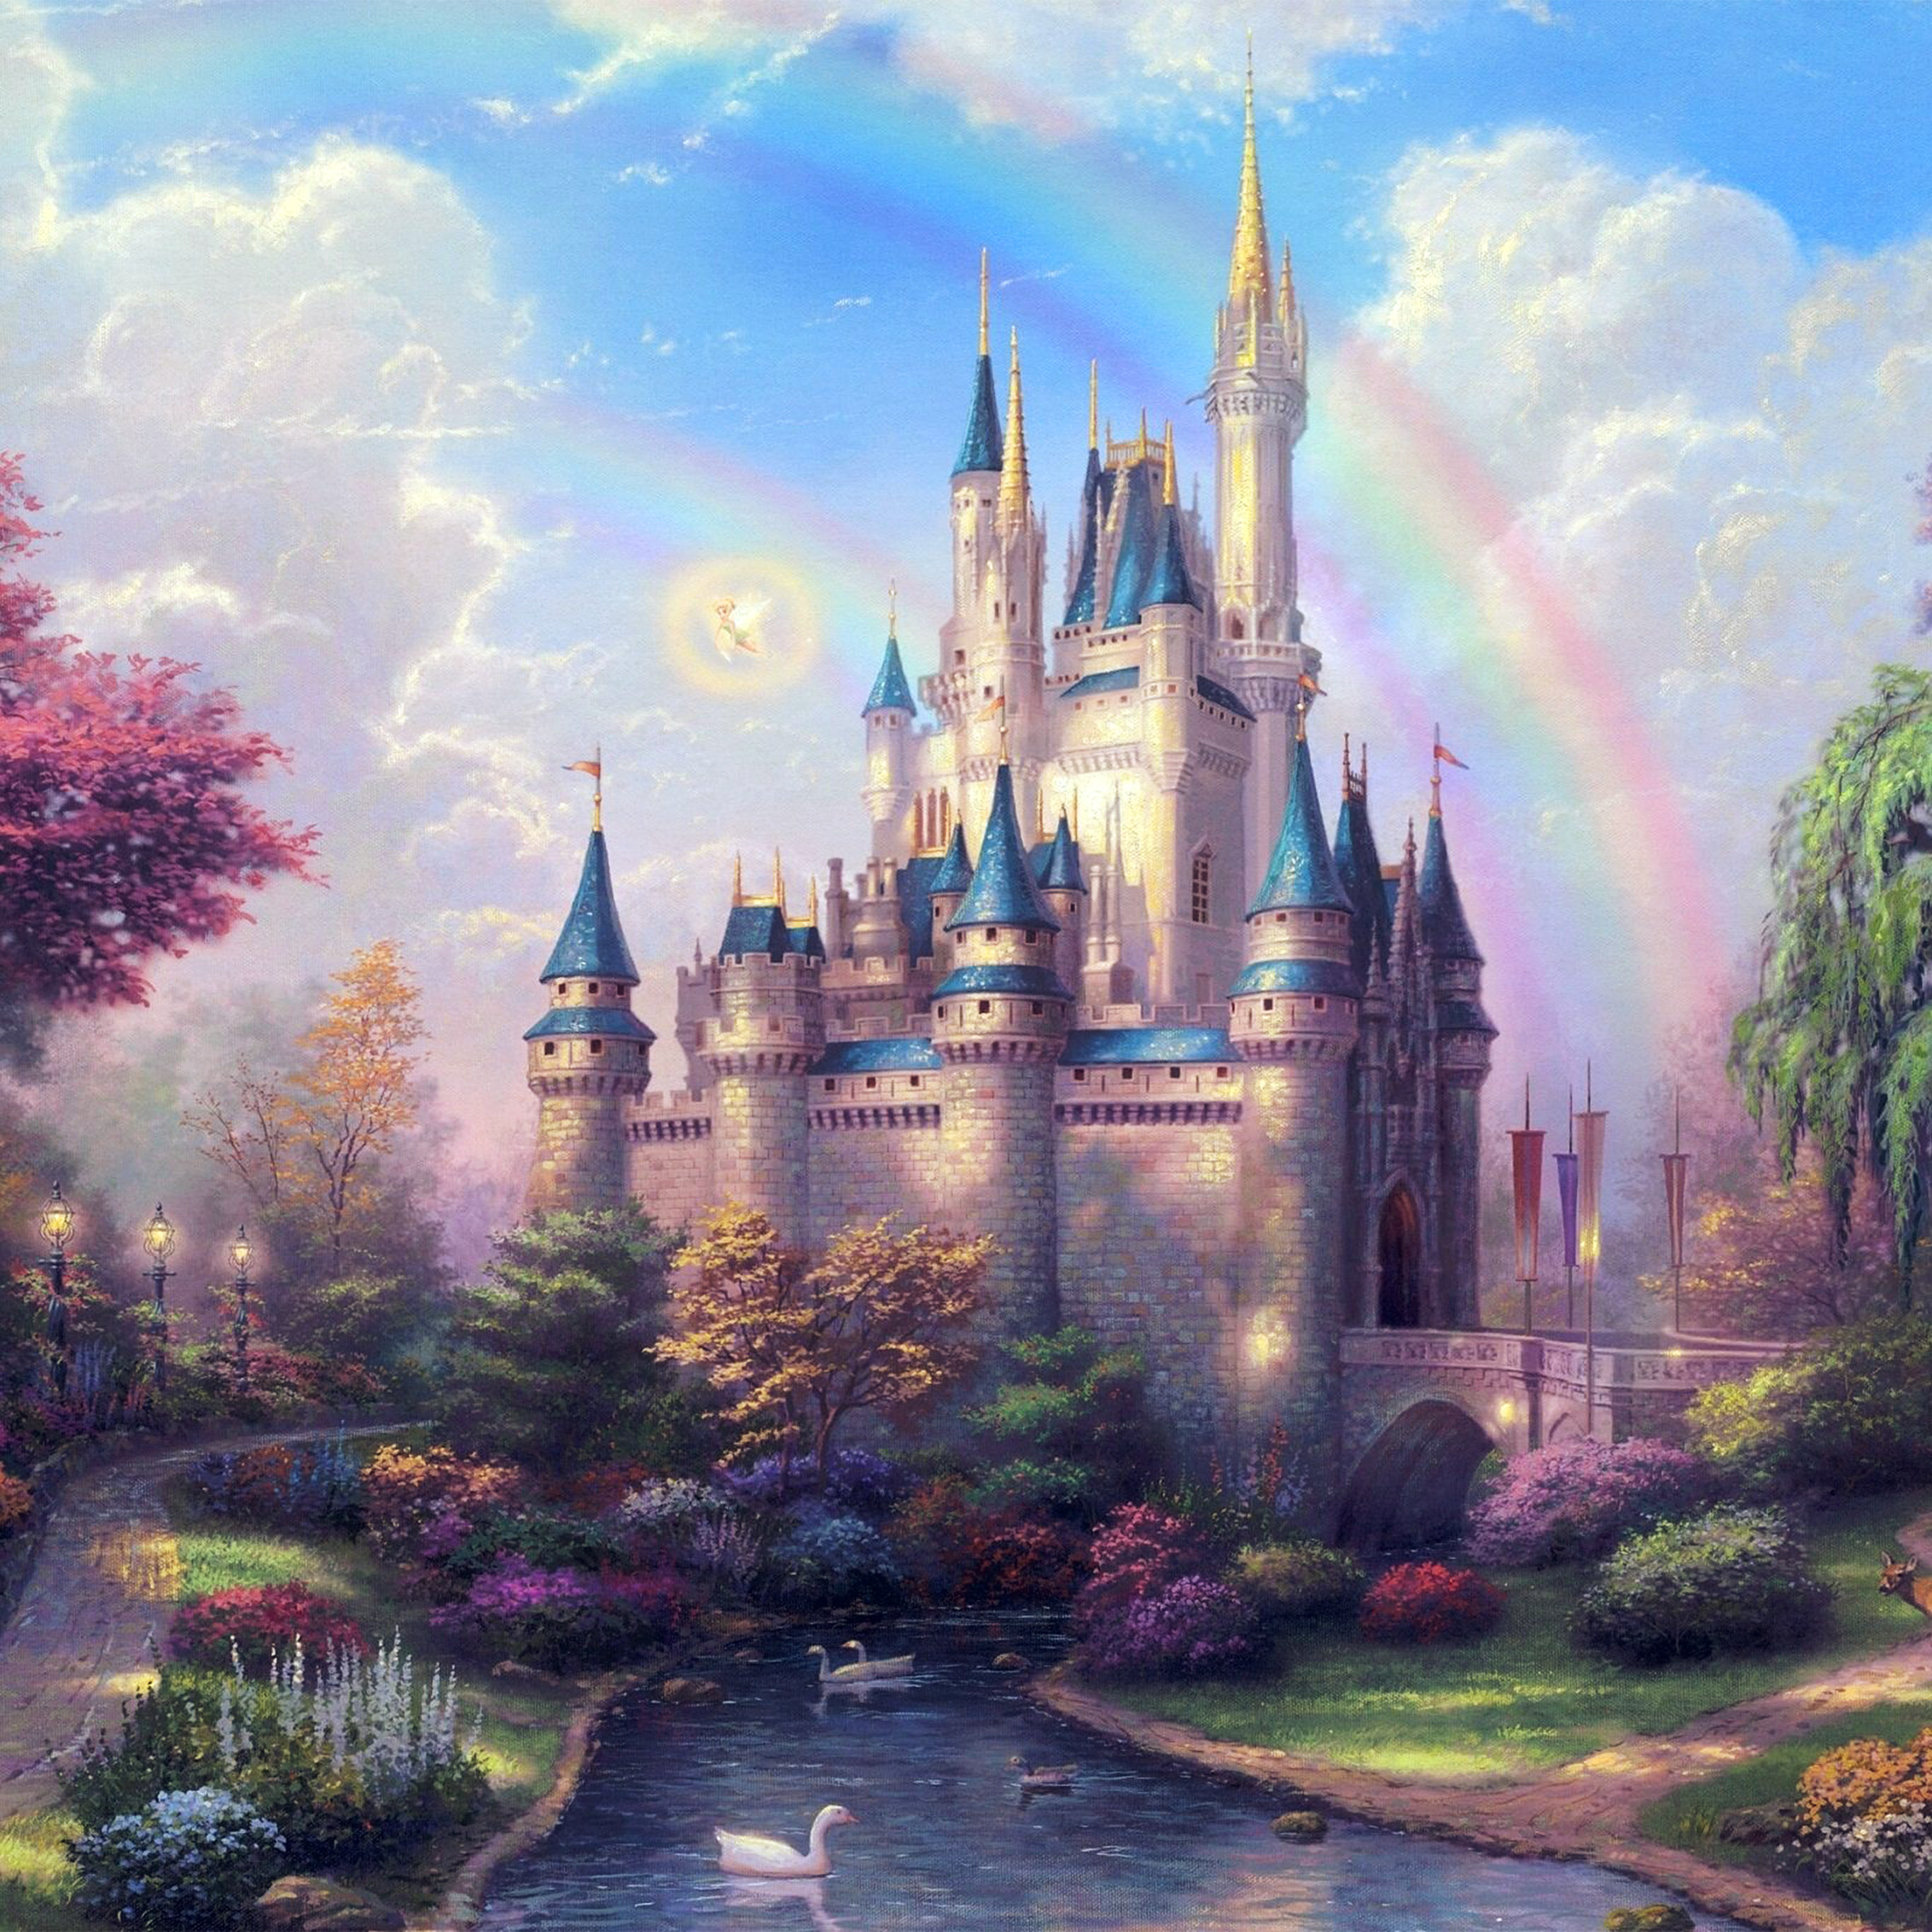 Ap98-fantasy-castle-illustration-cute-disney-wallpaper